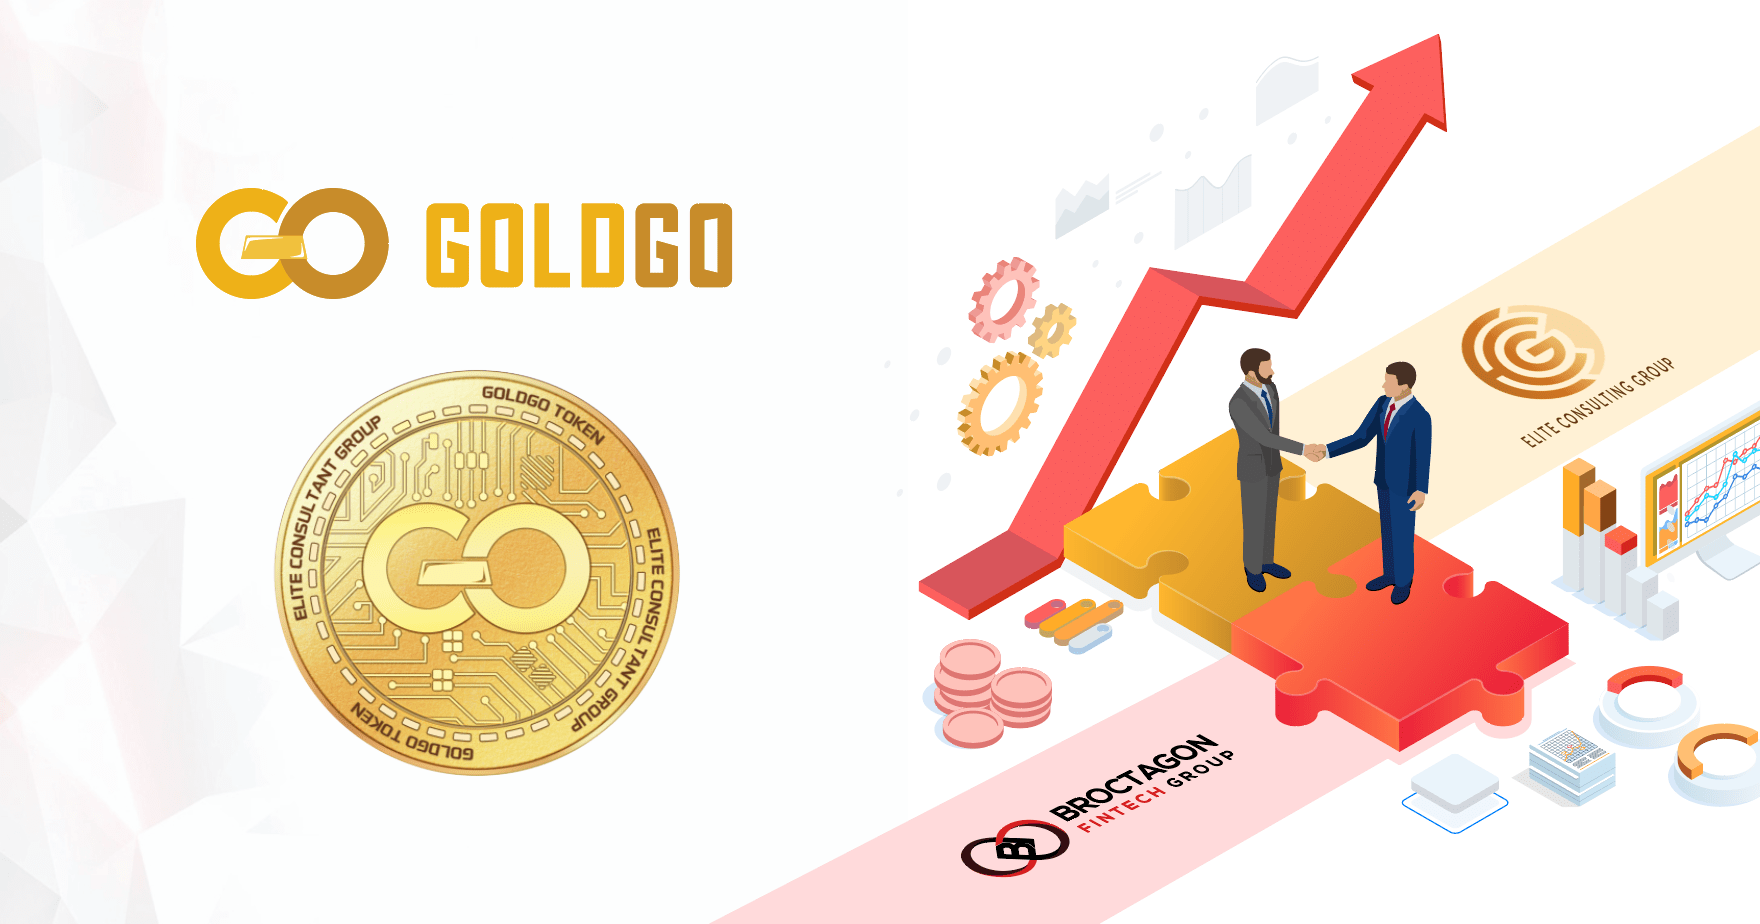 goldgo broctagon elite consulting group